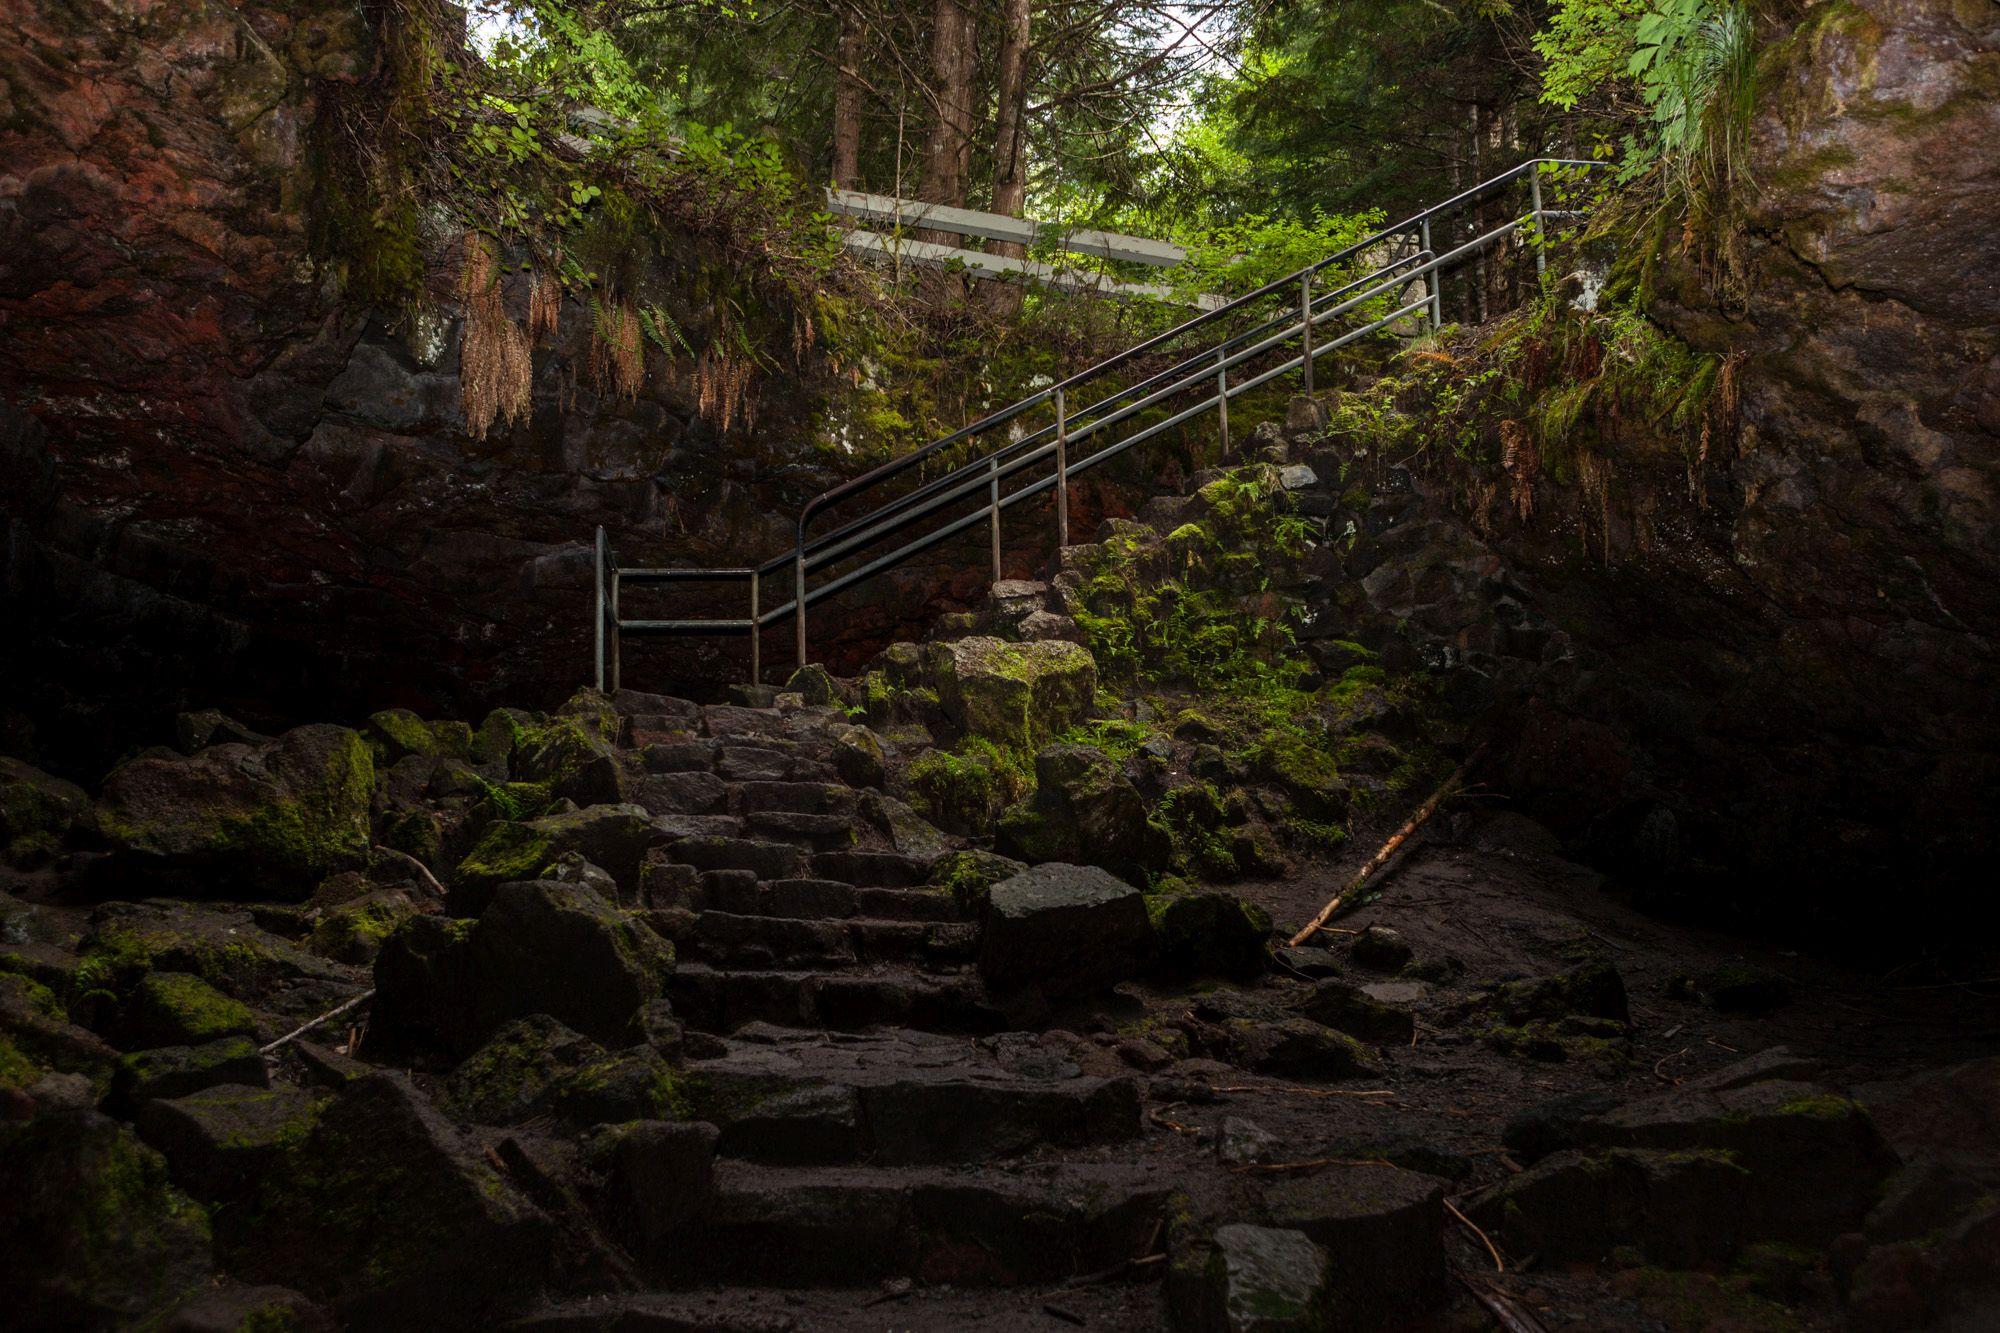 Underground Adventure inside the Ape Cave Lava Tube